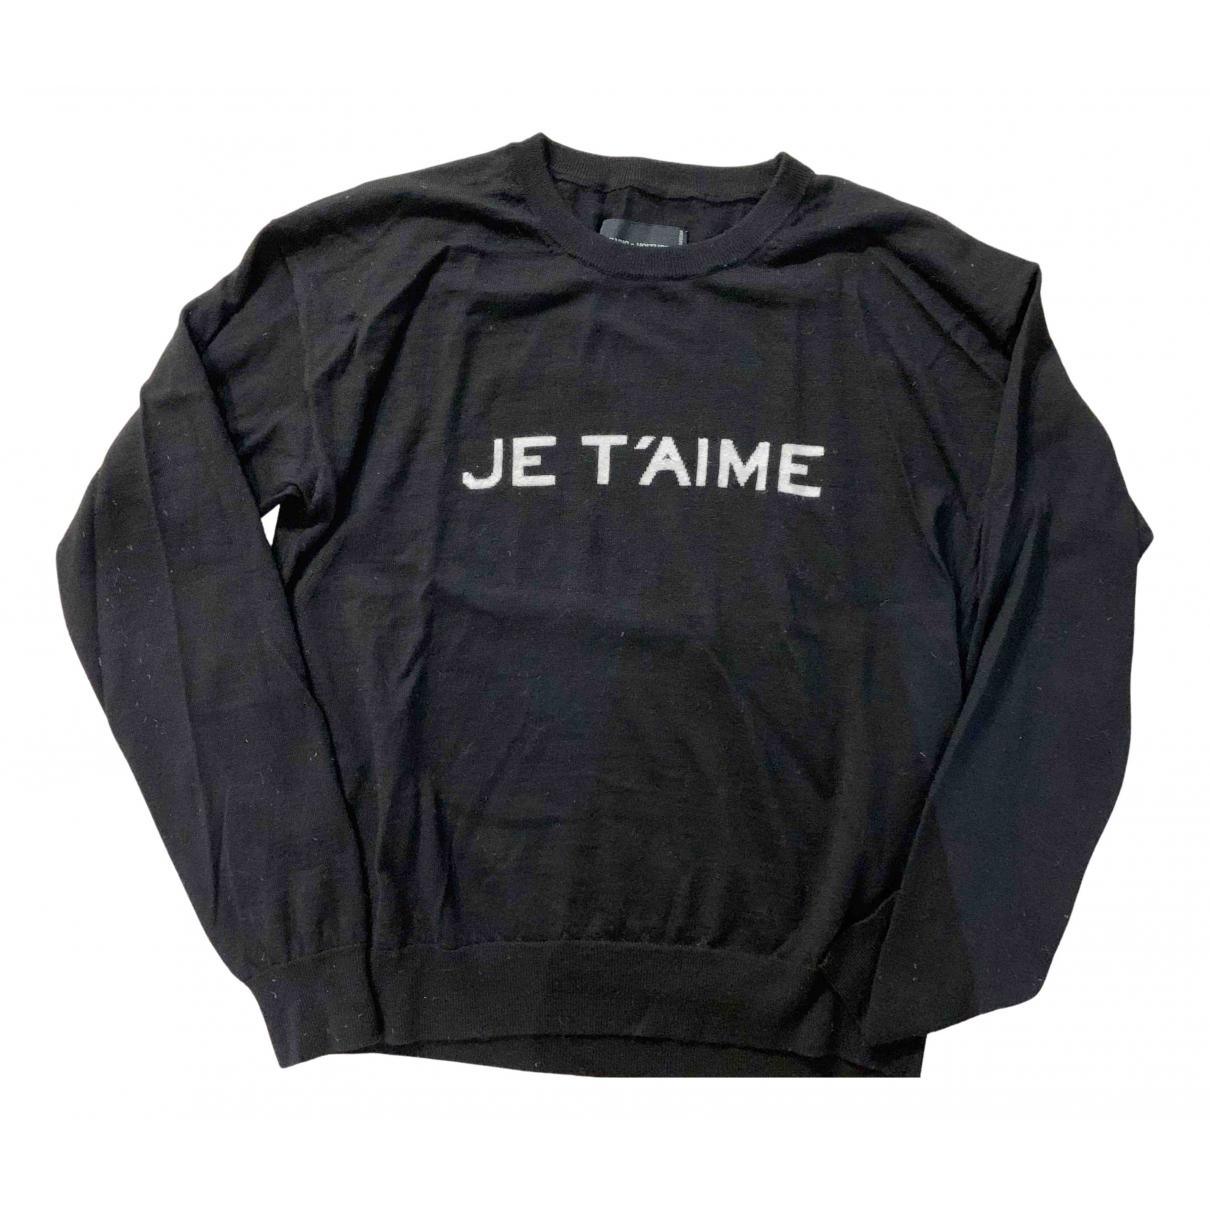 Zadig & Voltaire Spring Summer 2019 Black Wool Knitwear for Women 36 FR